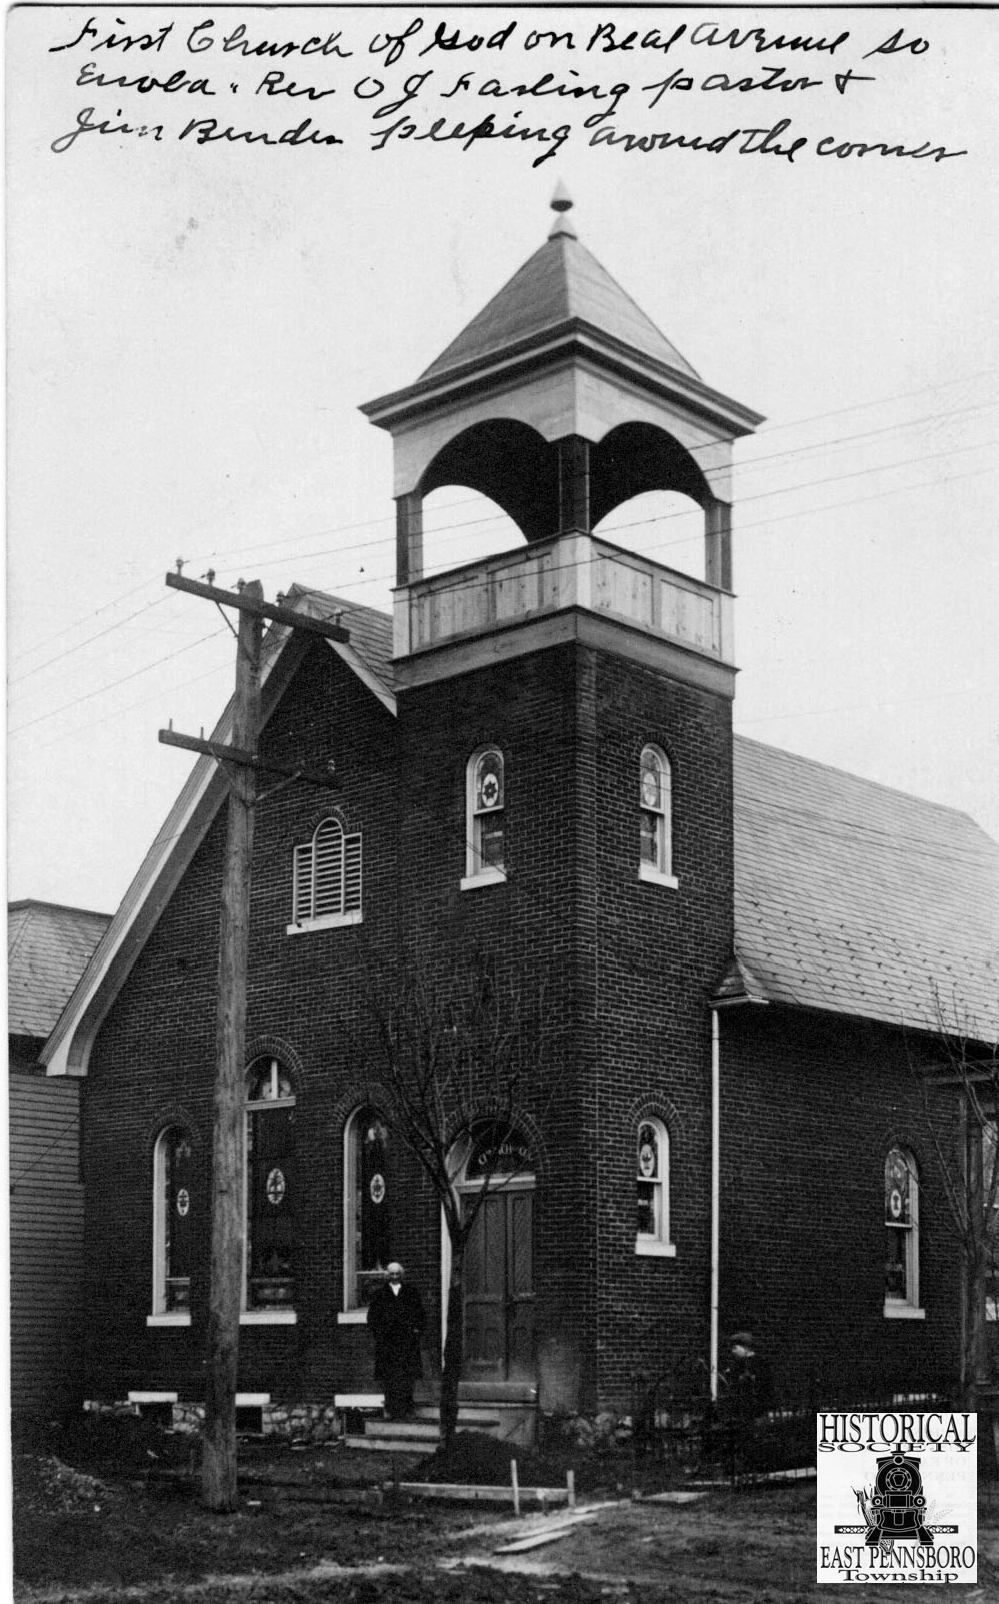 Church of God on Beale Ave